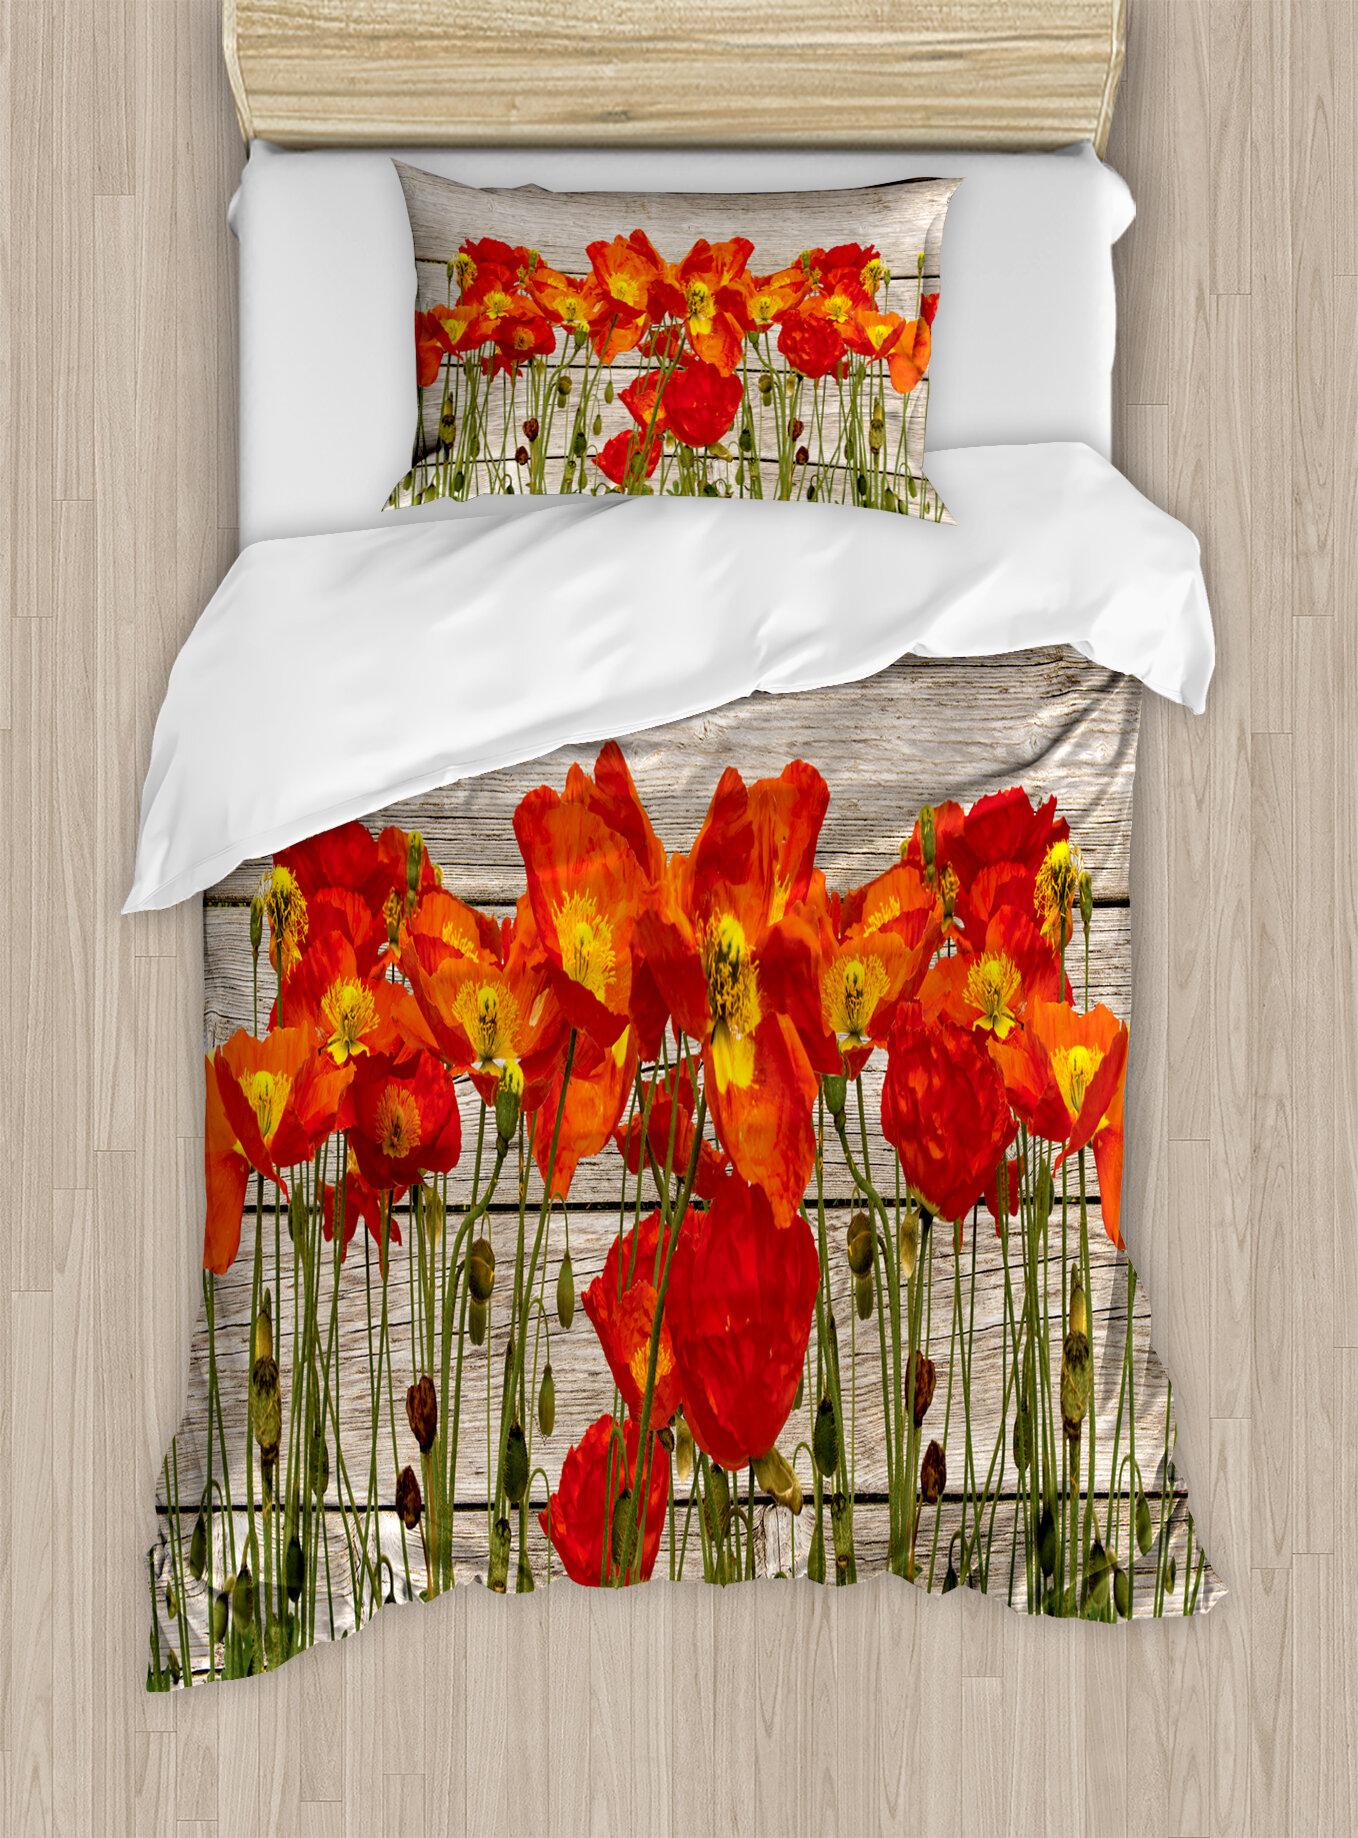 Poppy Floral Summer Duvet Quilt Cover Bedding Bed Linens Set